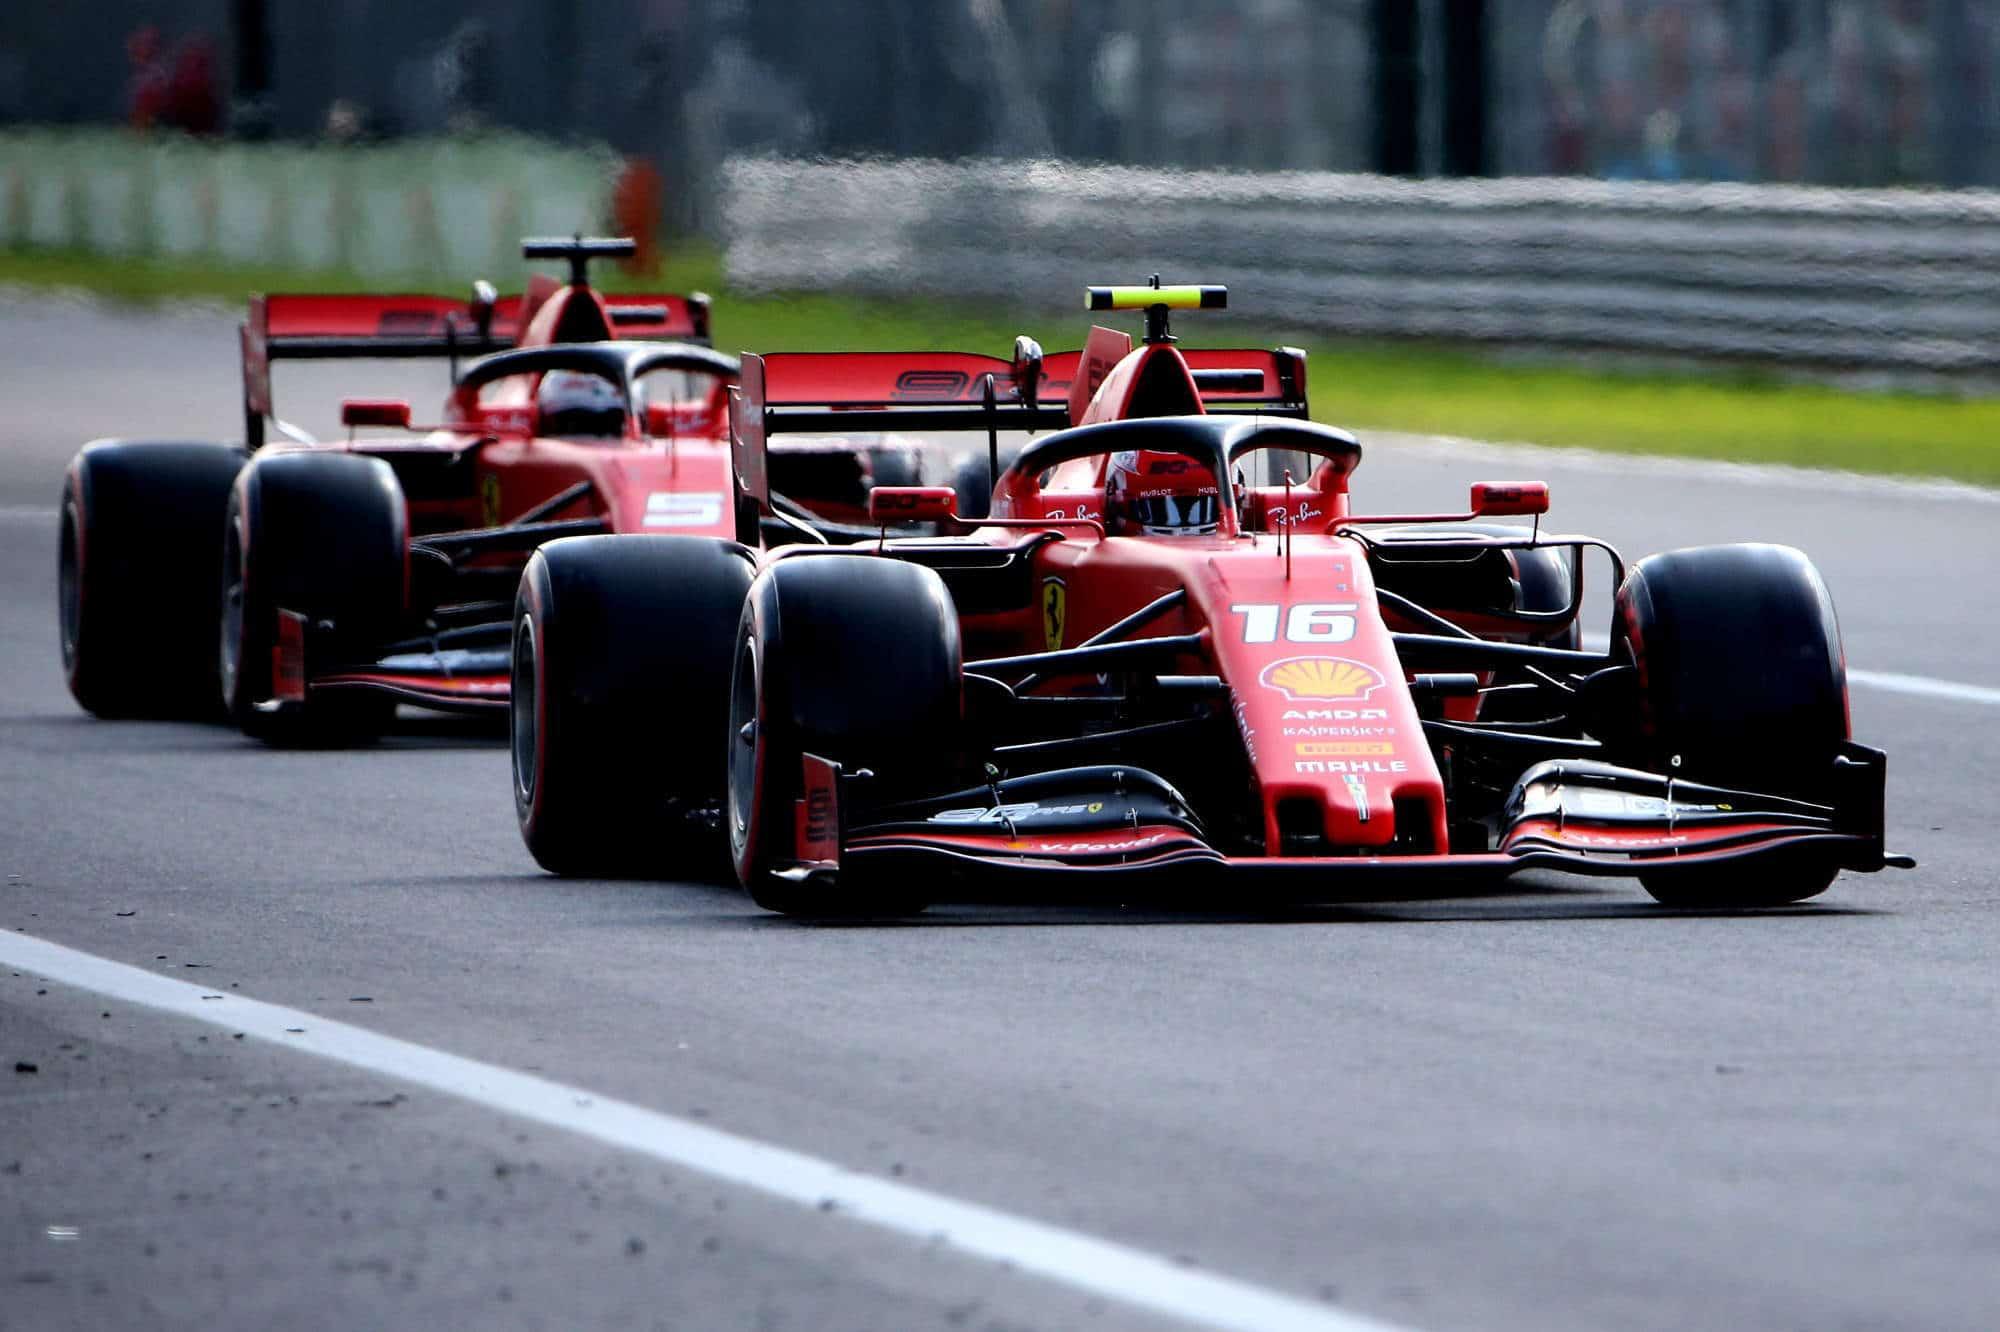 Charles Leclerc leads Sebastian Vettel Ferrari Italian GP F1 2019 FP1 Photo Ferrari